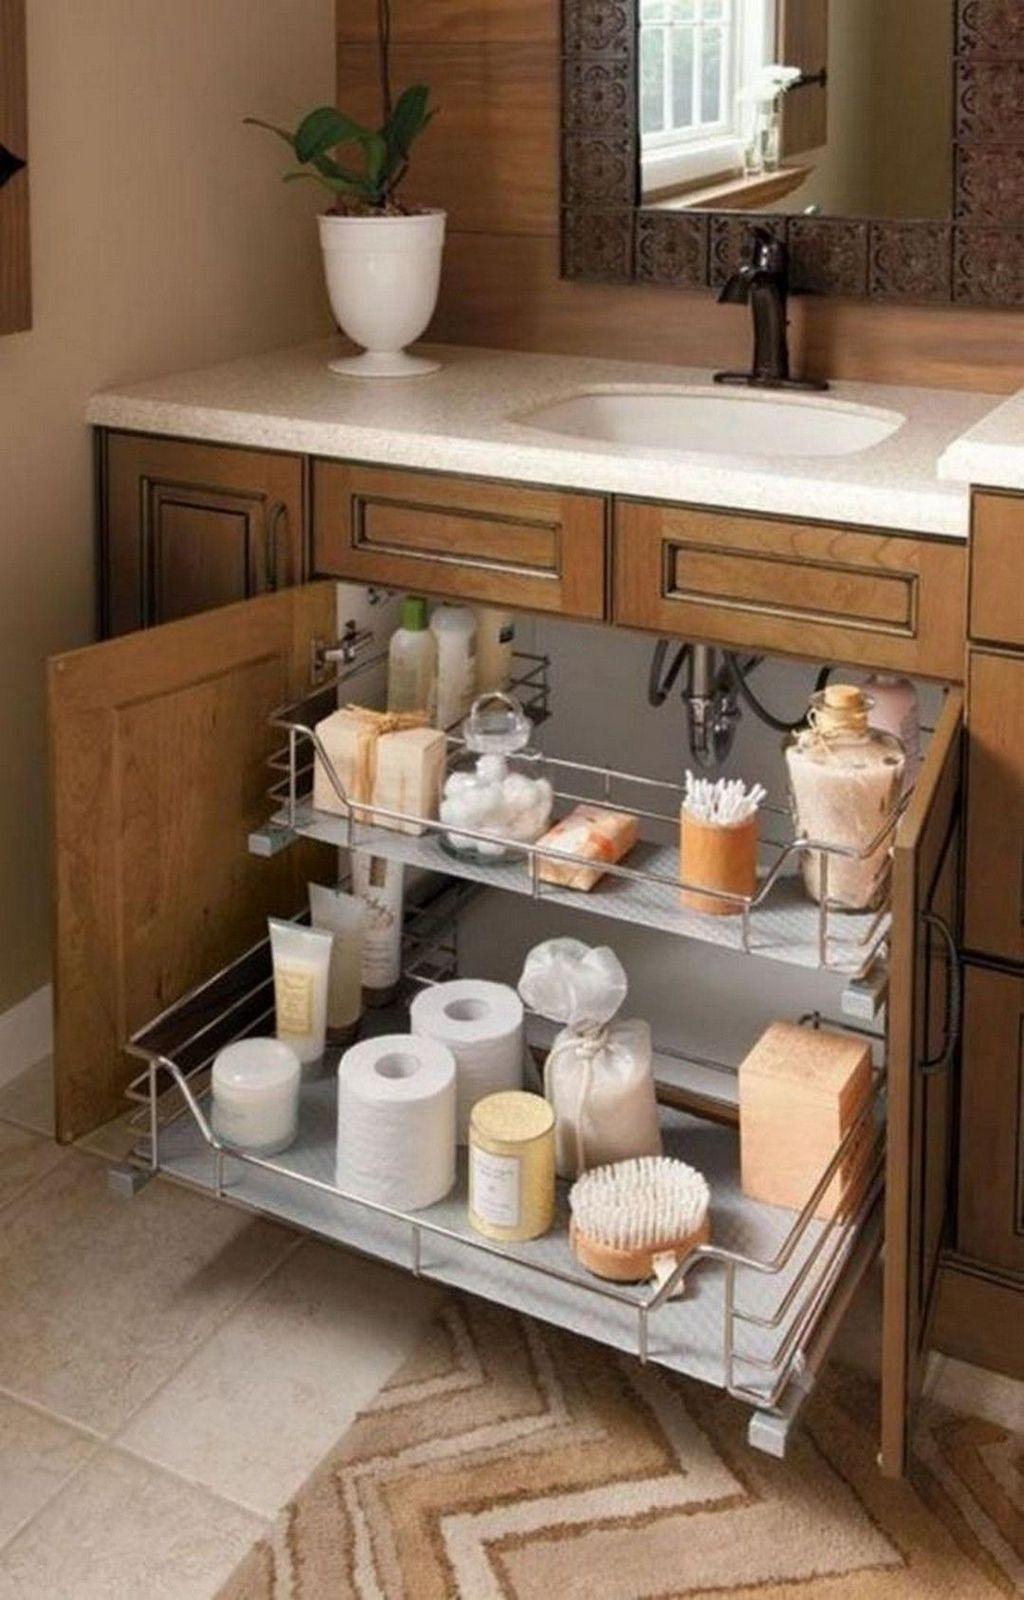 30 Inspiring Bathroom Storage Ideas To Enhance Your Bathroom Quality In 2020 Bathroom Storage Solutions Small Bathroom Storage Bathroom Storage Organization